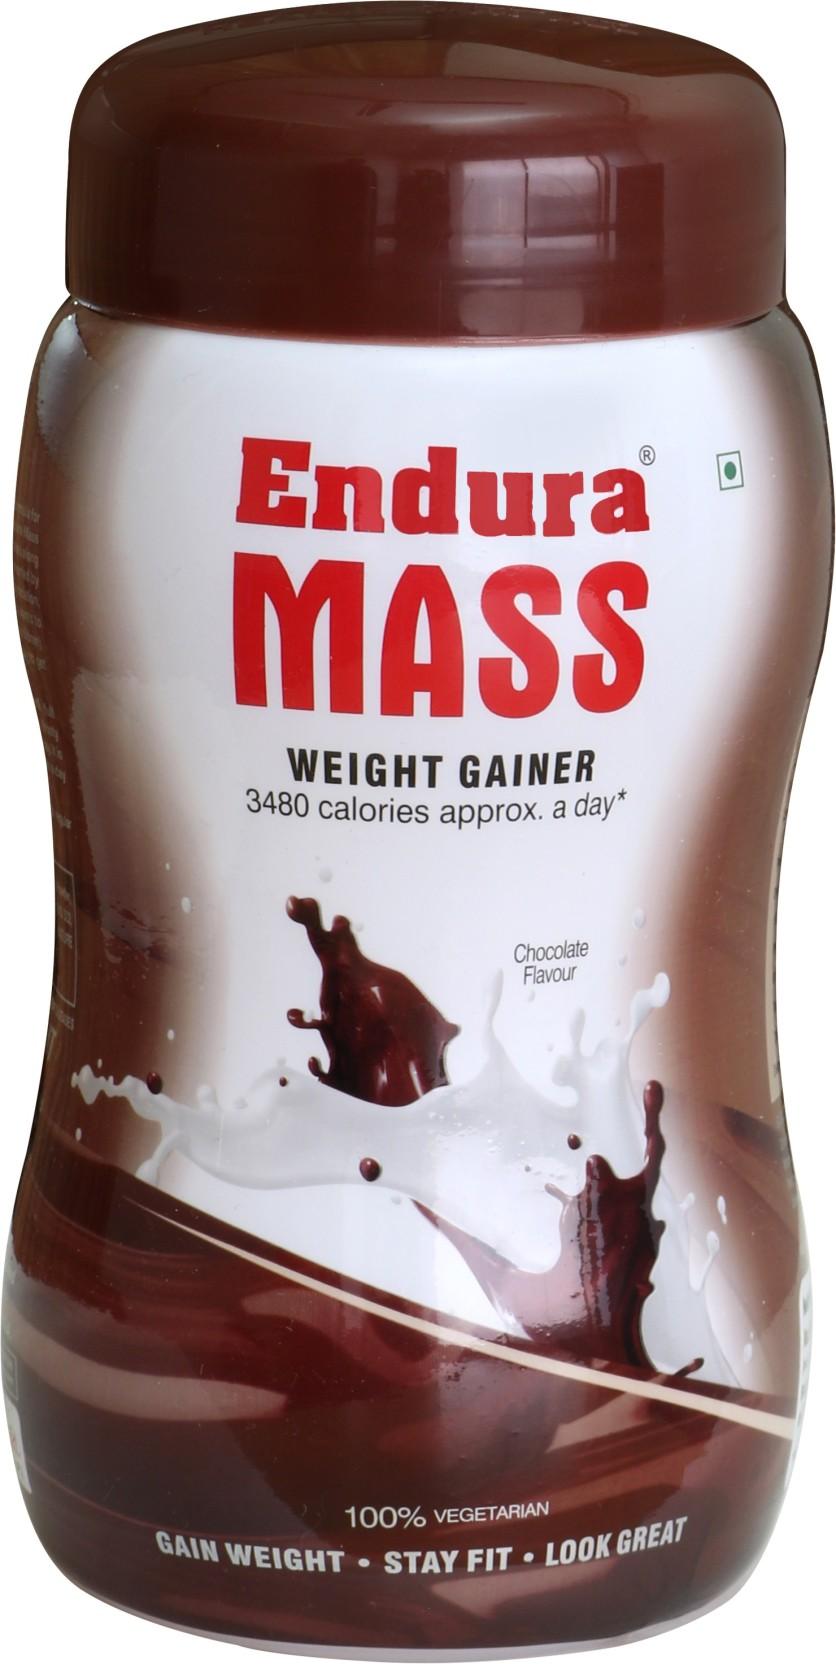 Endura Mass Weight Gainers Price In India Buy Ensure Vanila 400gr 15 Klg Trolley Bag Bestseller Add To Cart